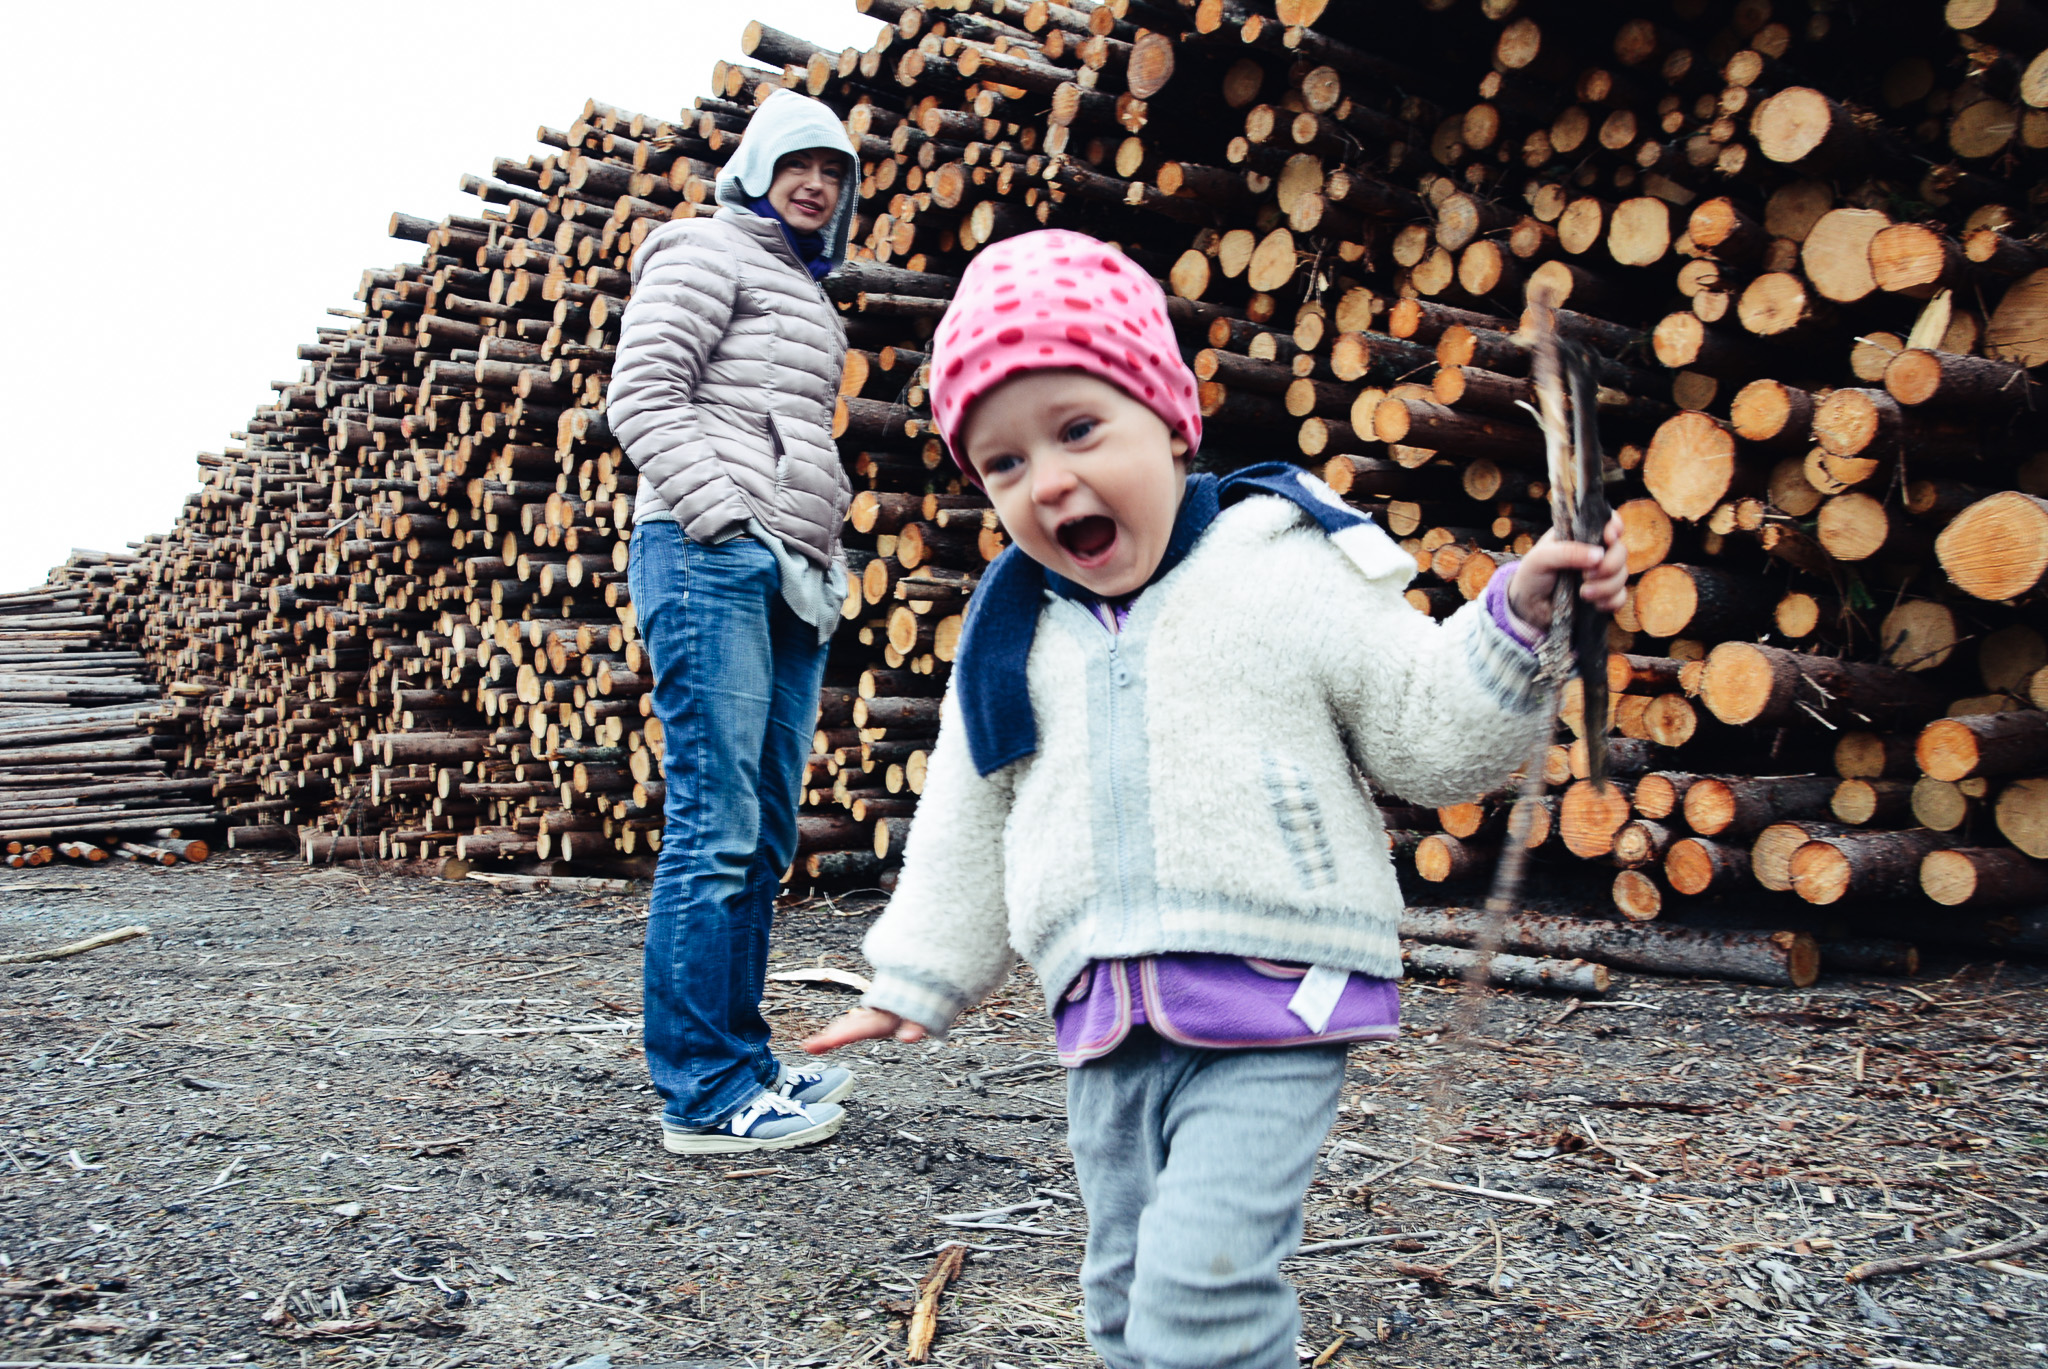 06-09-wood piles-13_LR edited_FB.jpg